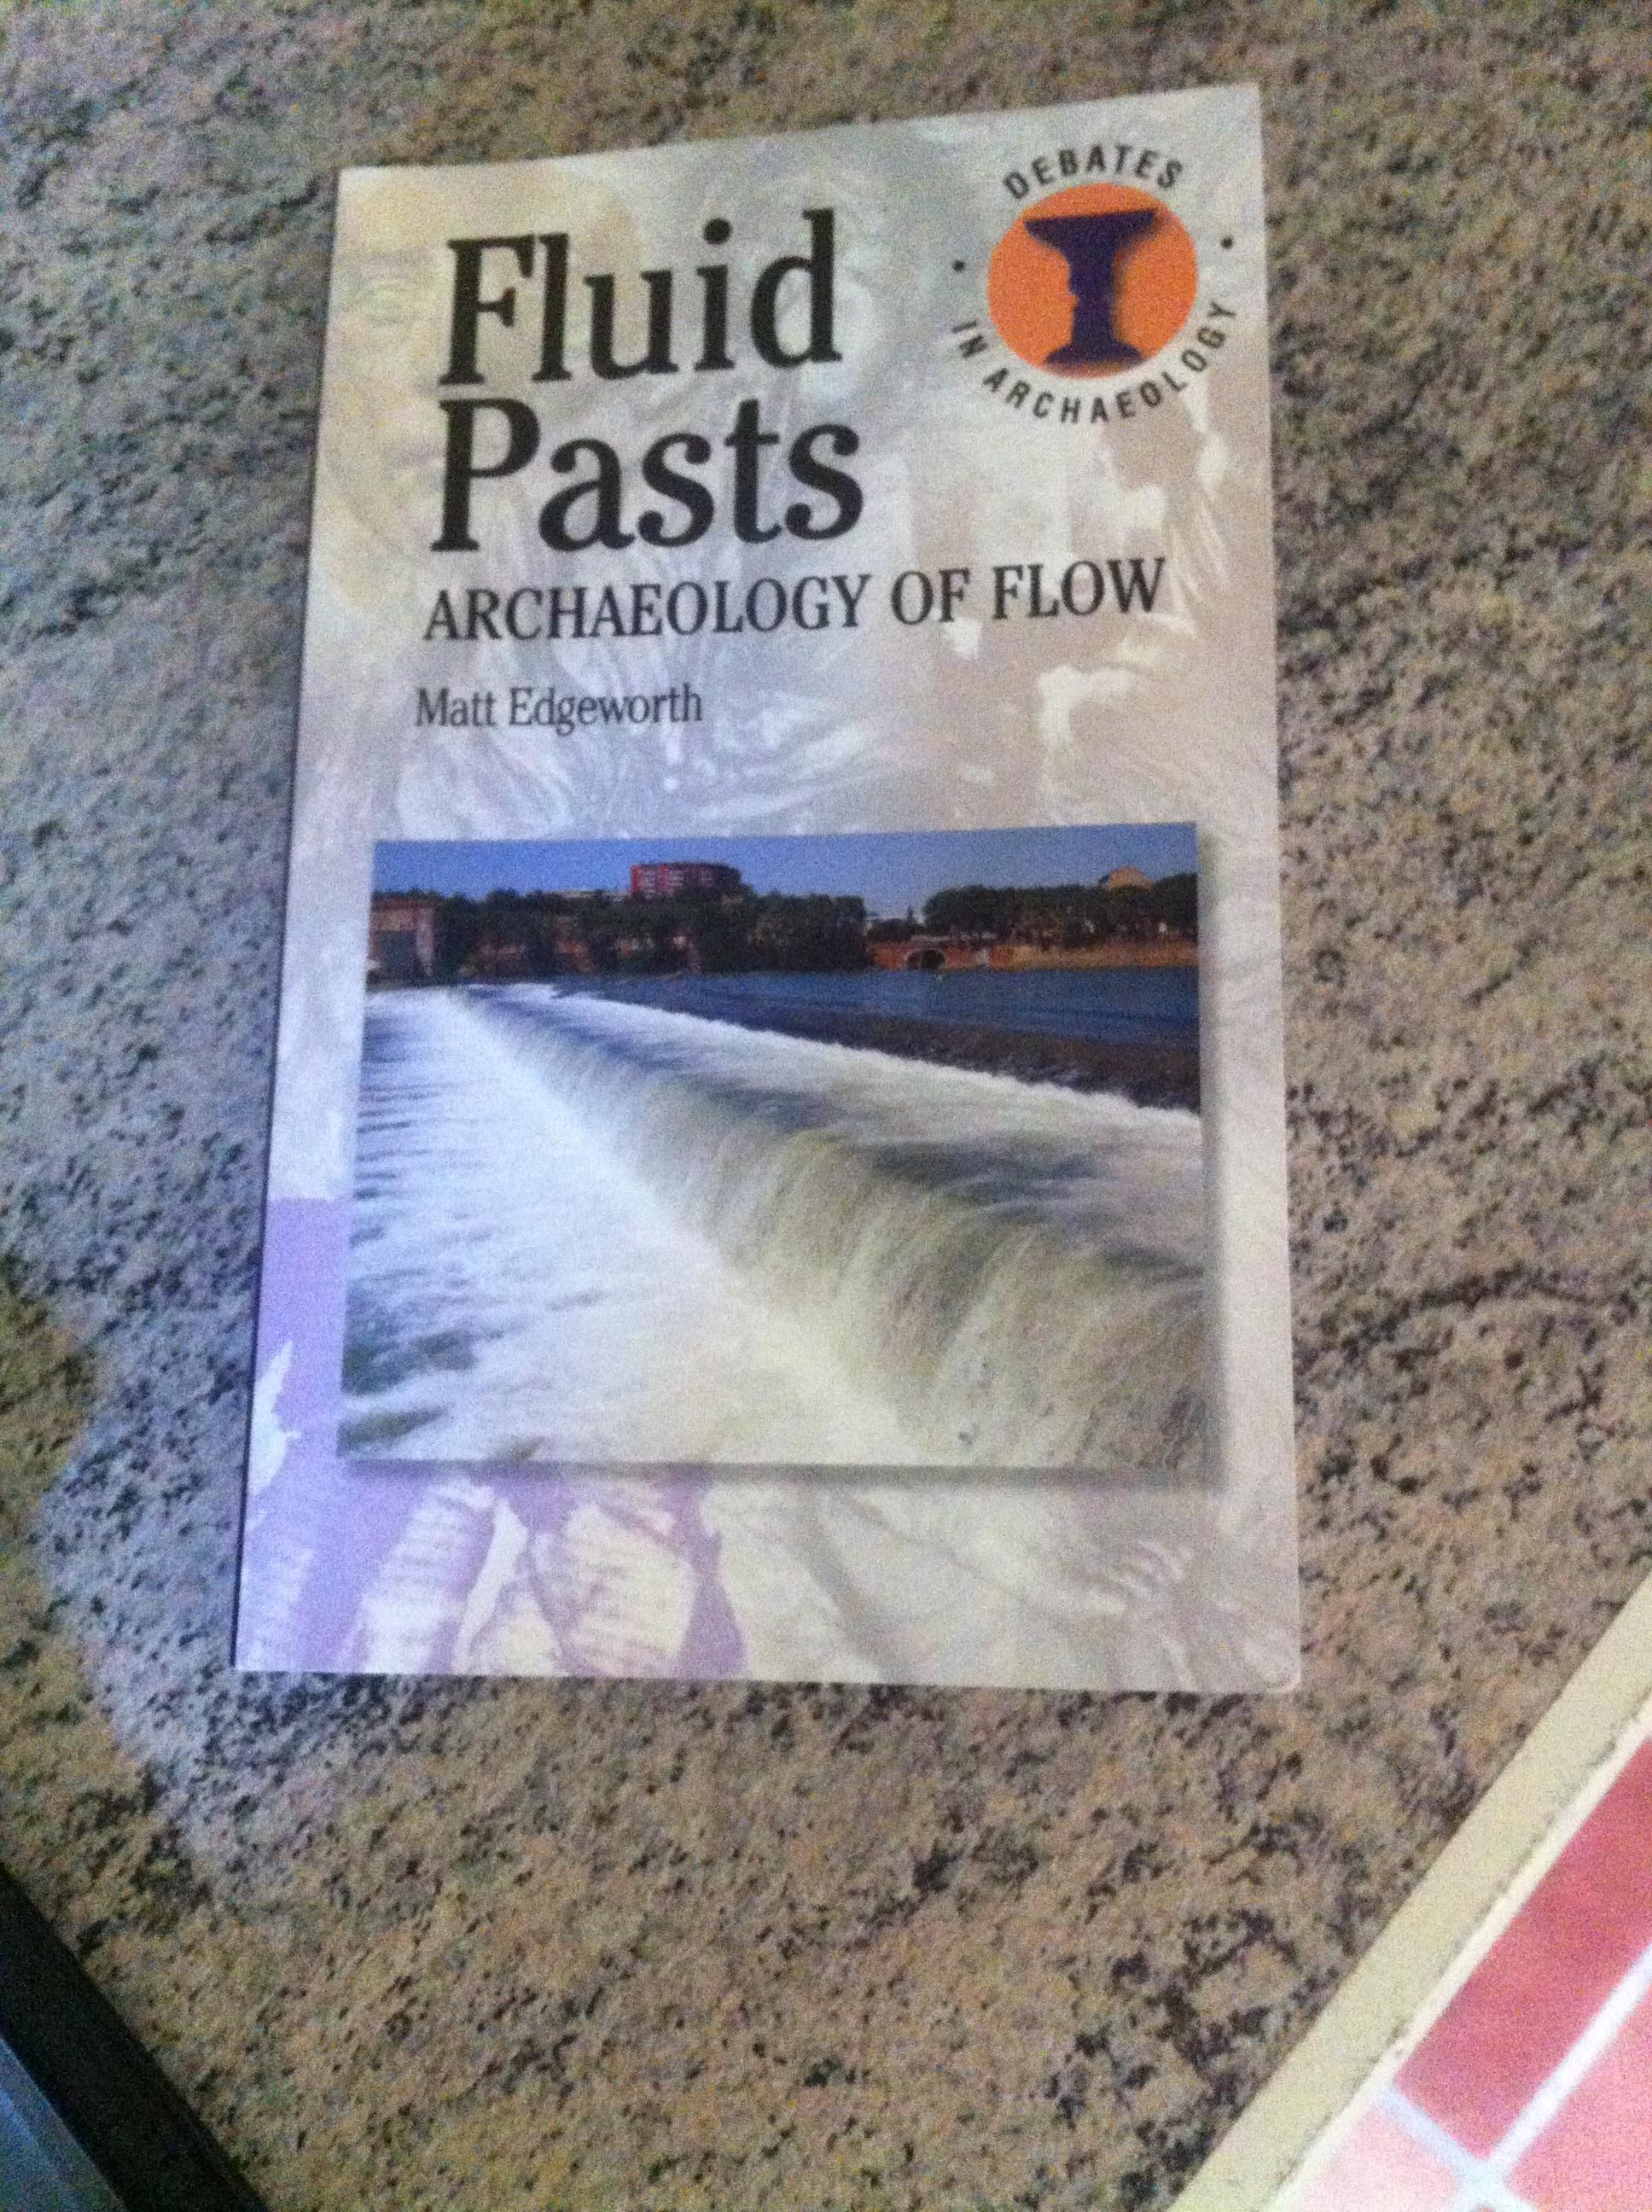 'Fluid-Pasts' a book by Dr. Matt Edgeworth